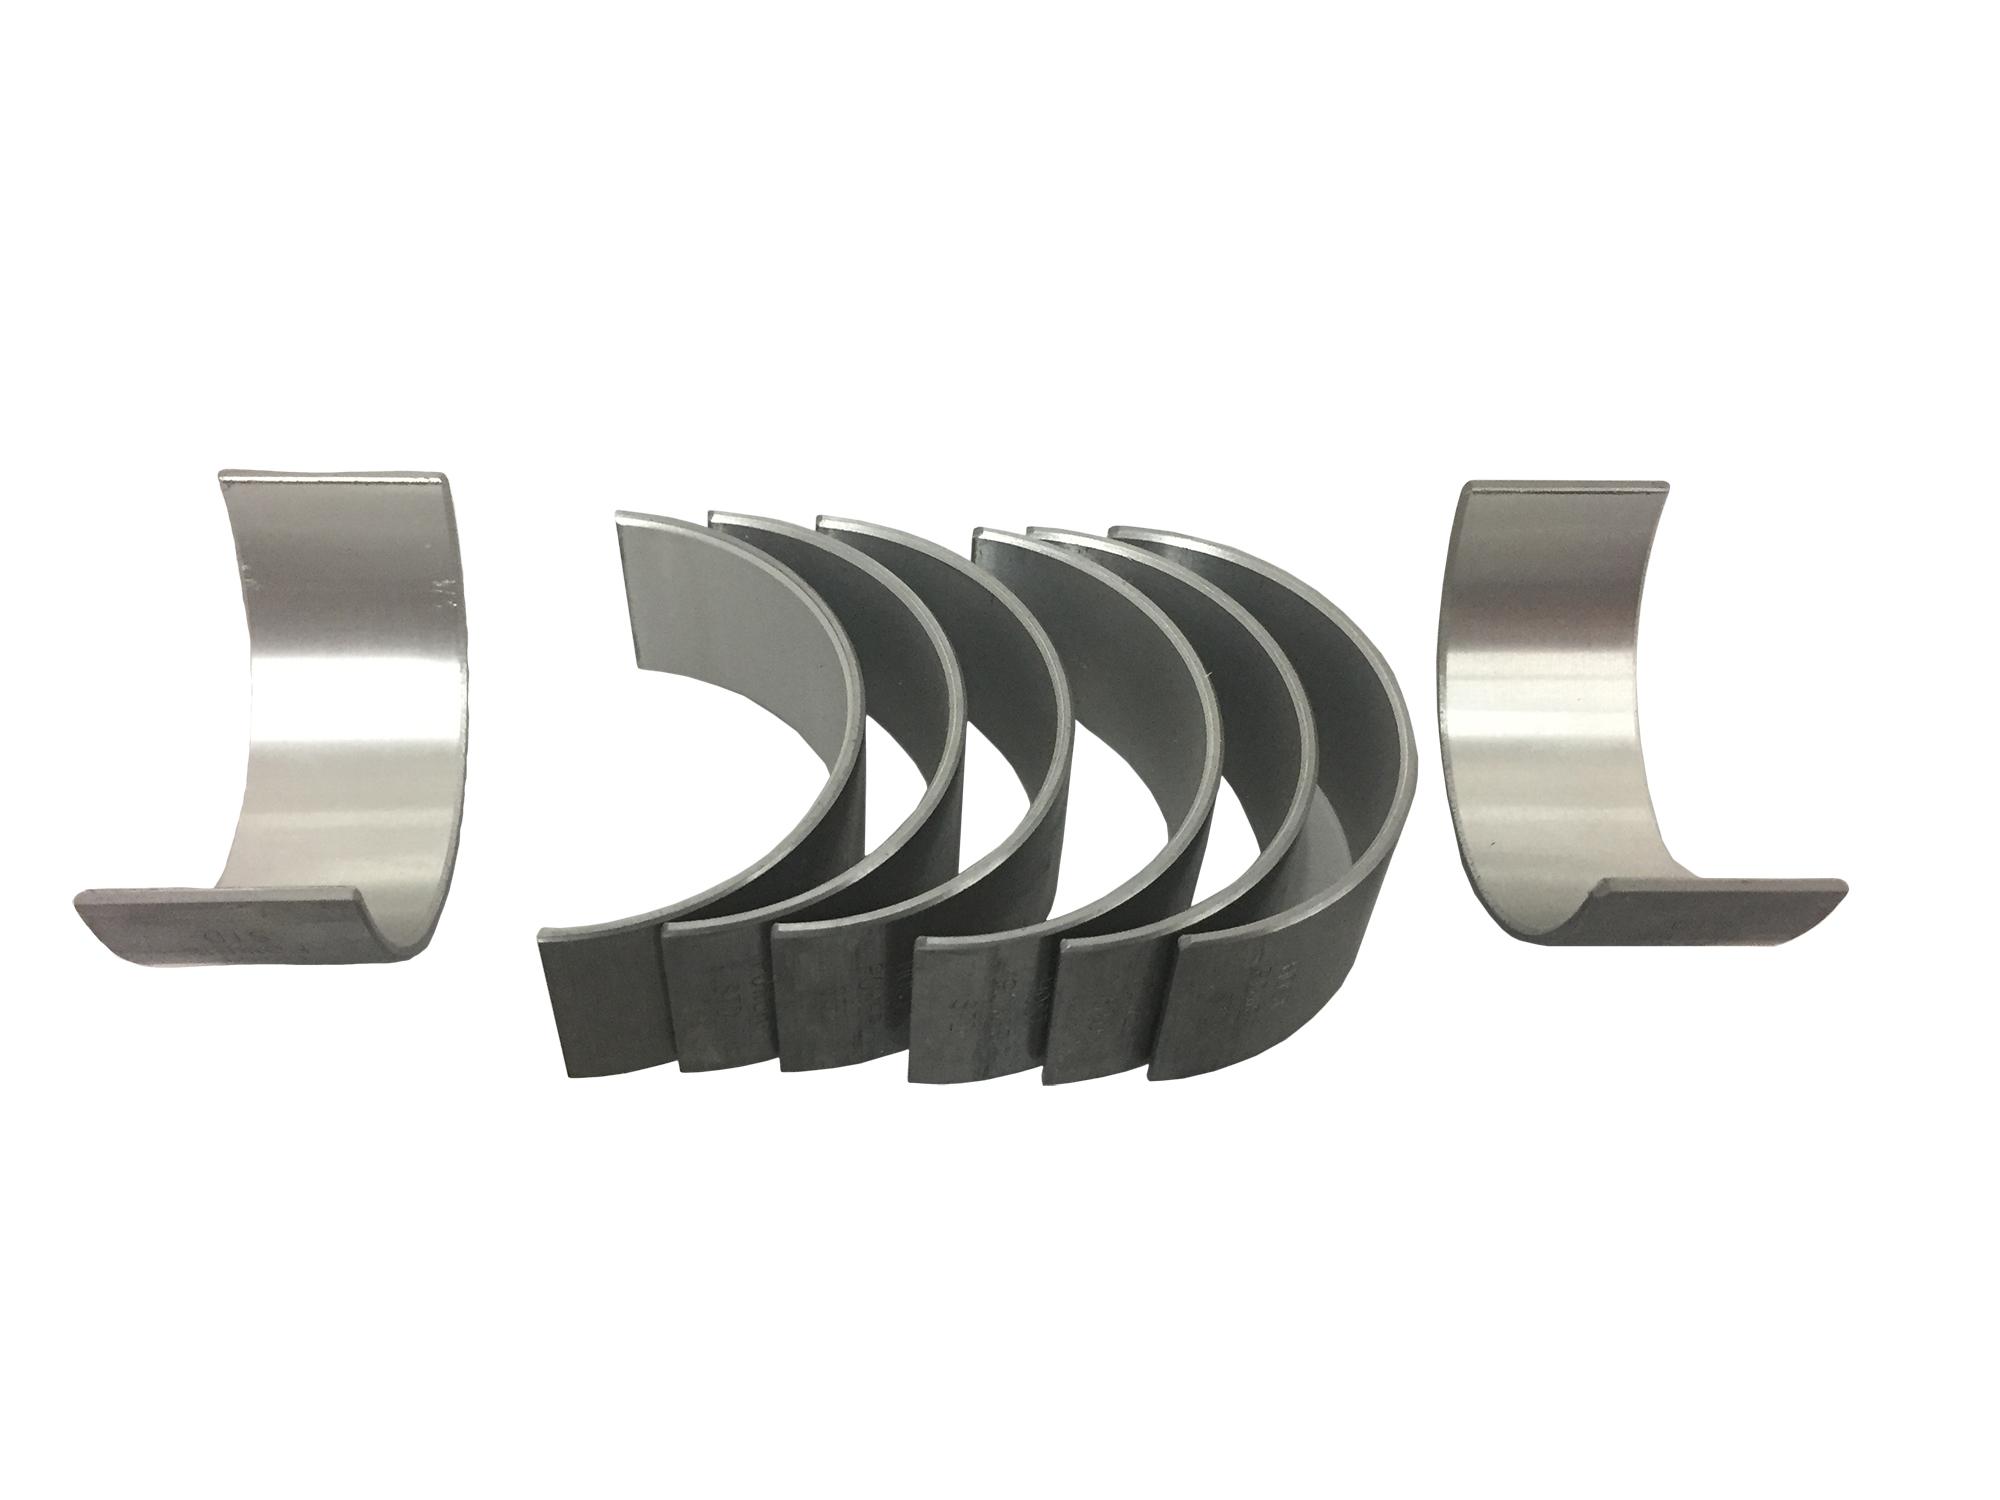 Pleuellagerschale Pleuellager Mini Cooper R56 1,6 N16B16A 11247586035 NEU